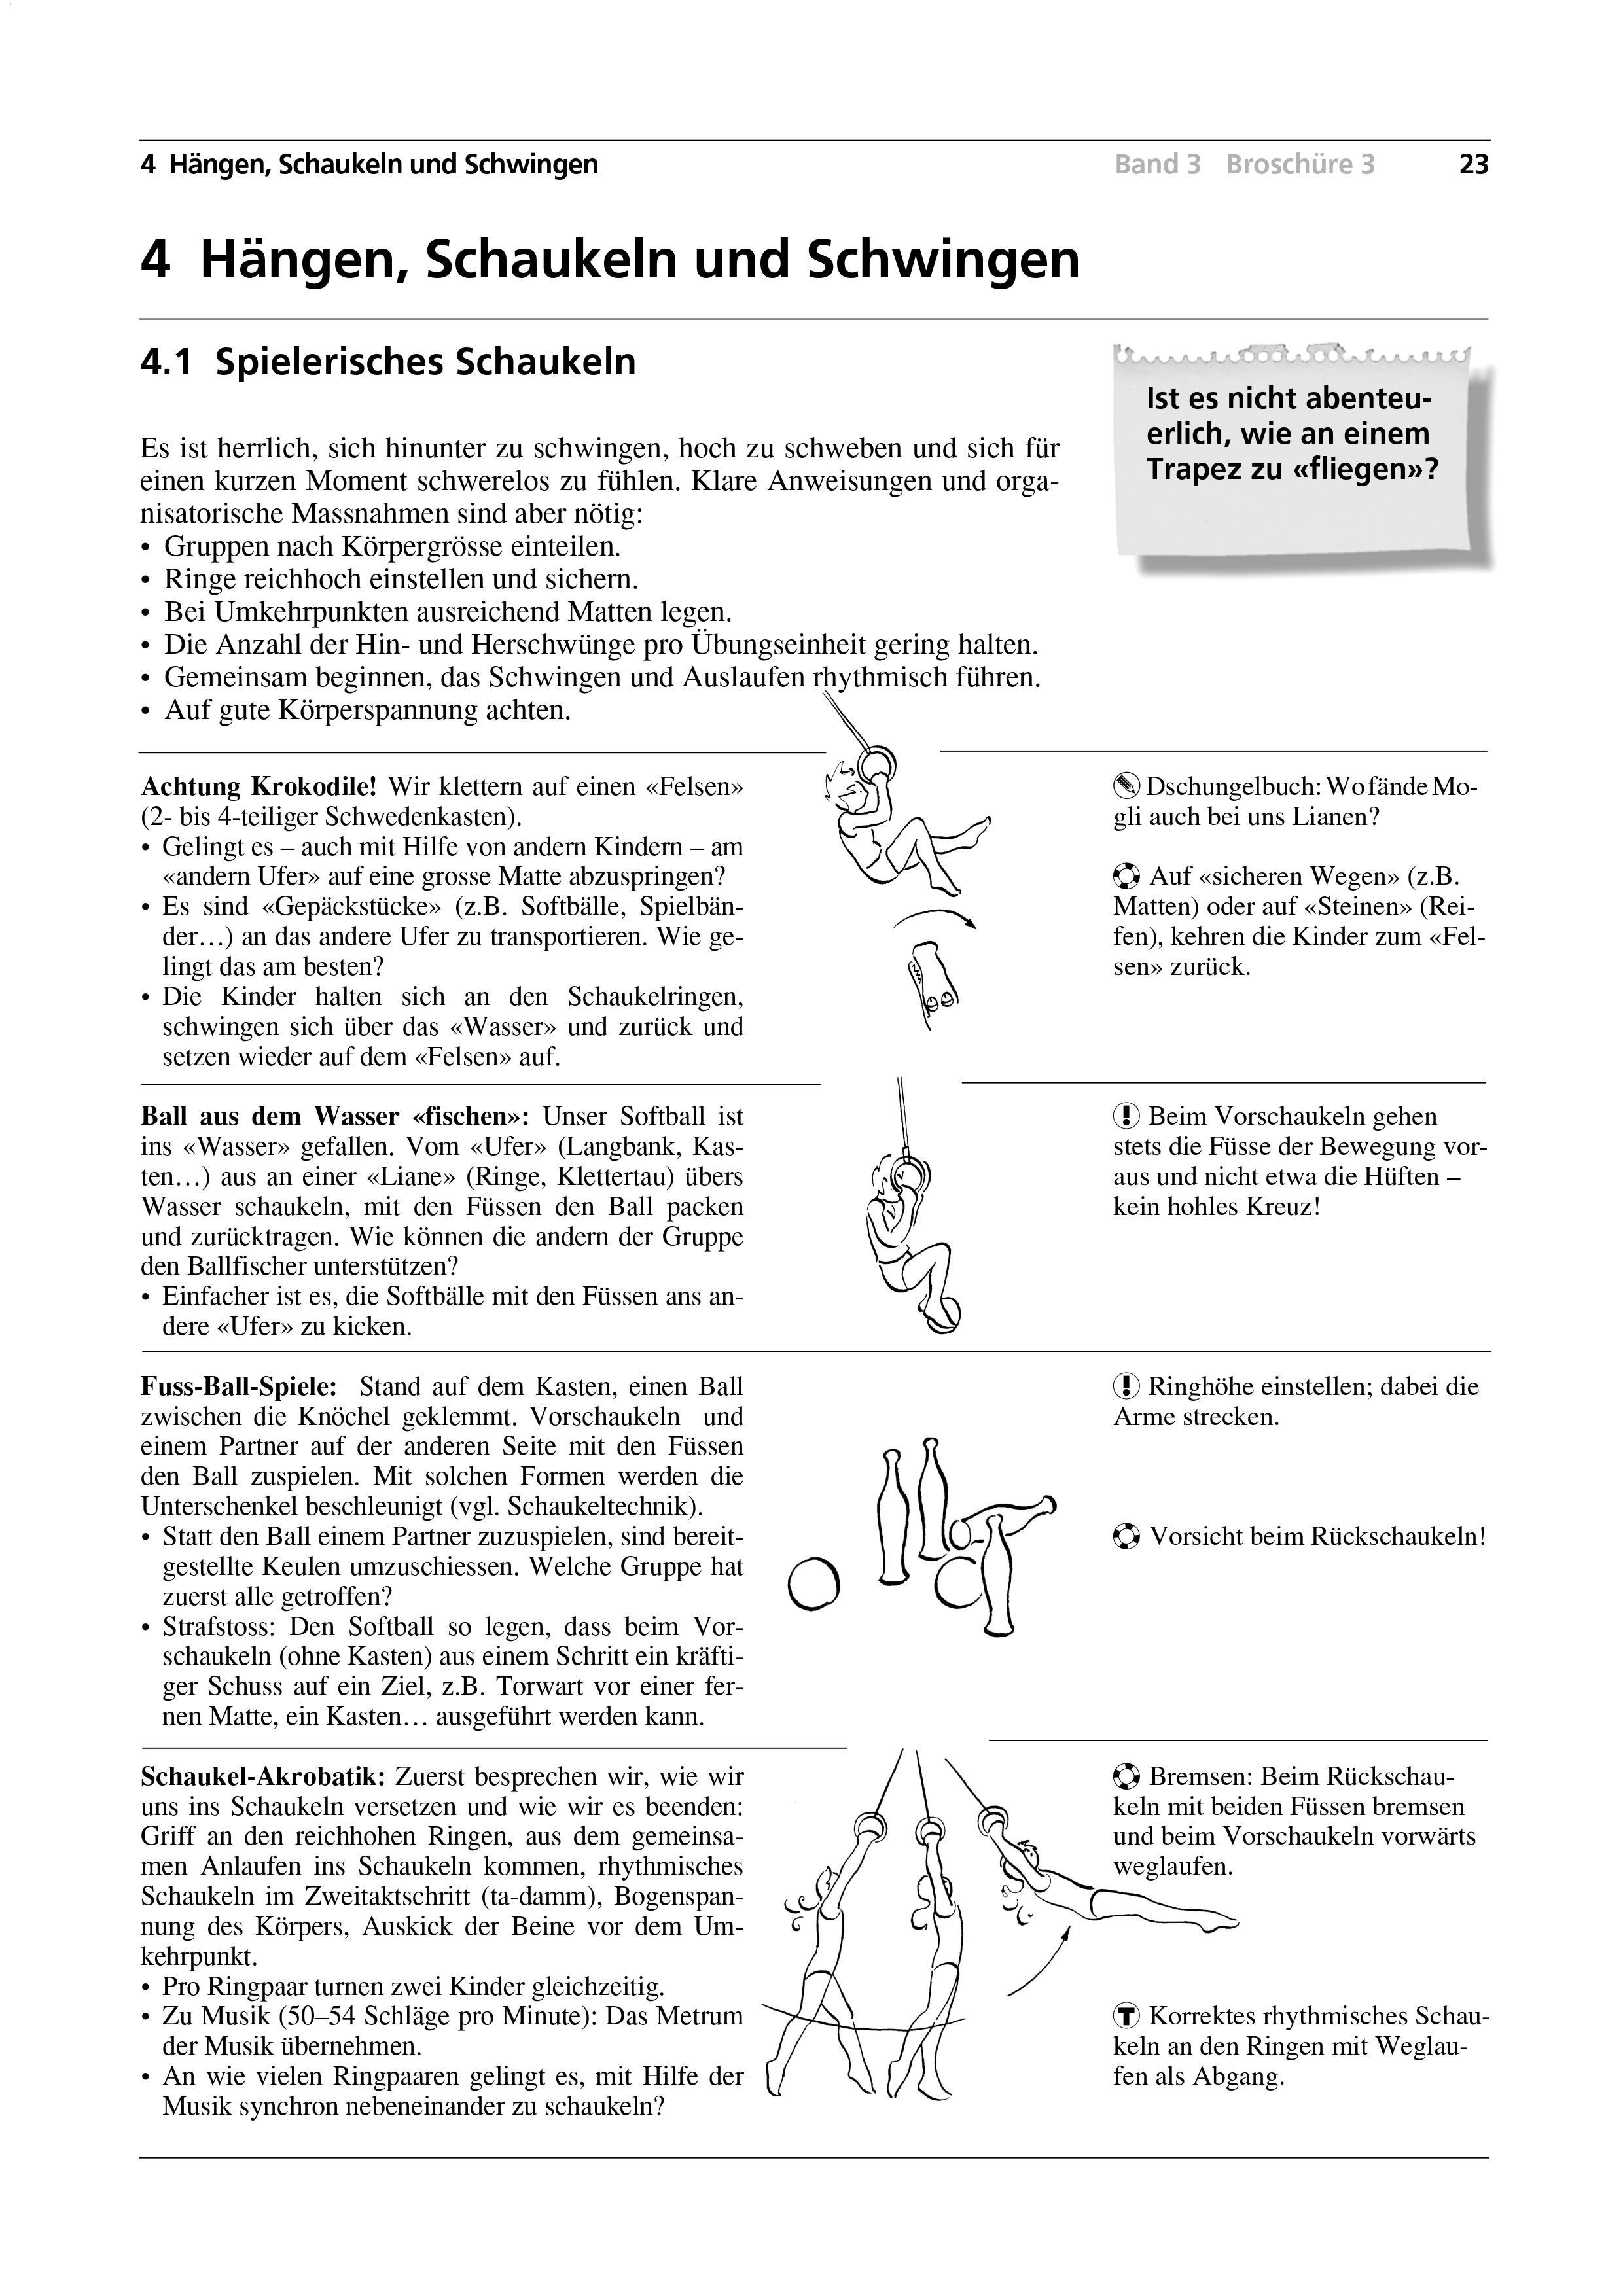 Preview image for LOM object Spielerisches Schaukeln